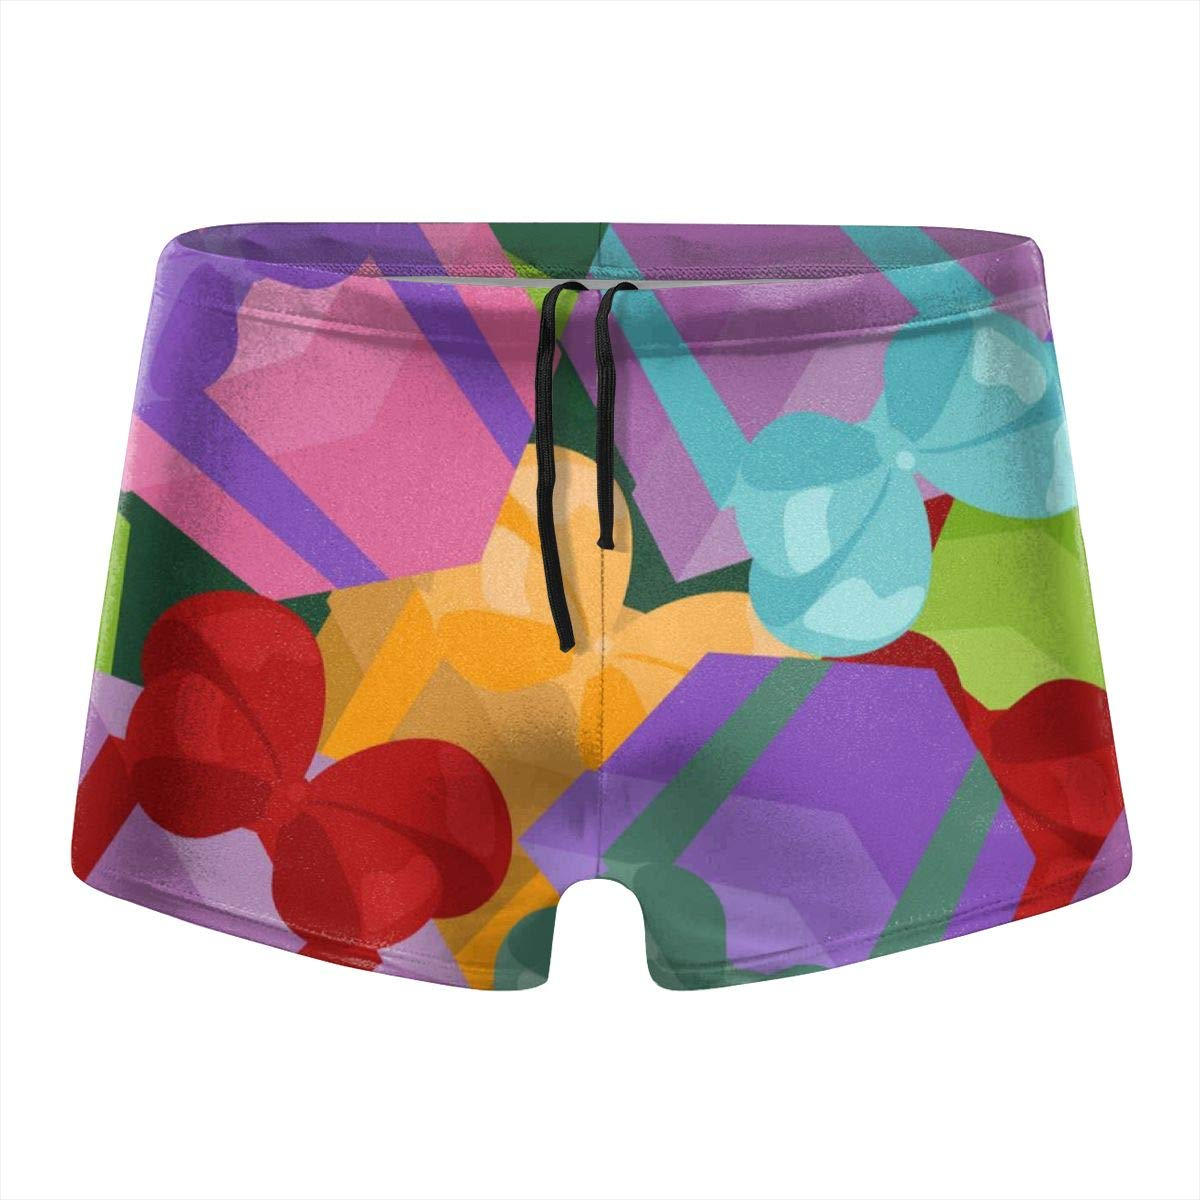 349tg1u Bright Colorful Gifts Mens Swim Trunks Shorts Athletic Swimwear Briefs Boardshorts